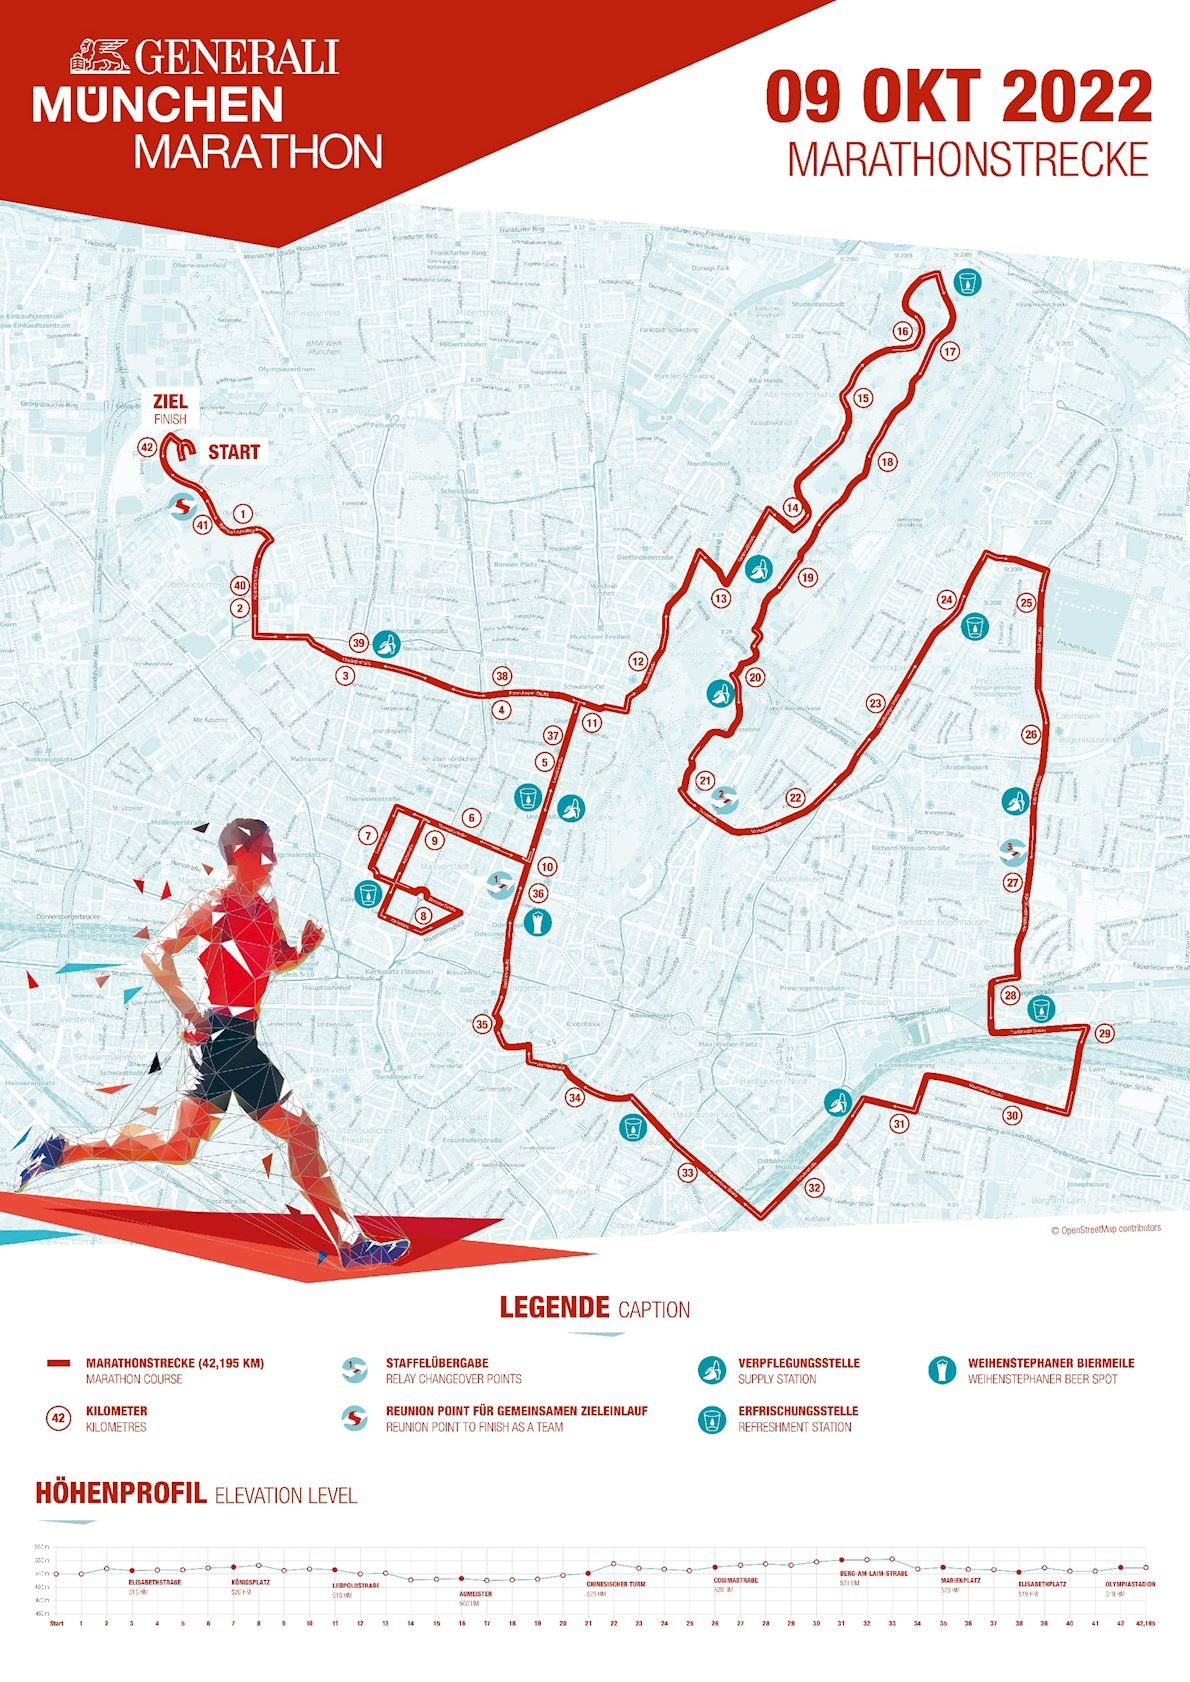 Generali München Marathon MAPA DEL RECORRIDO DE